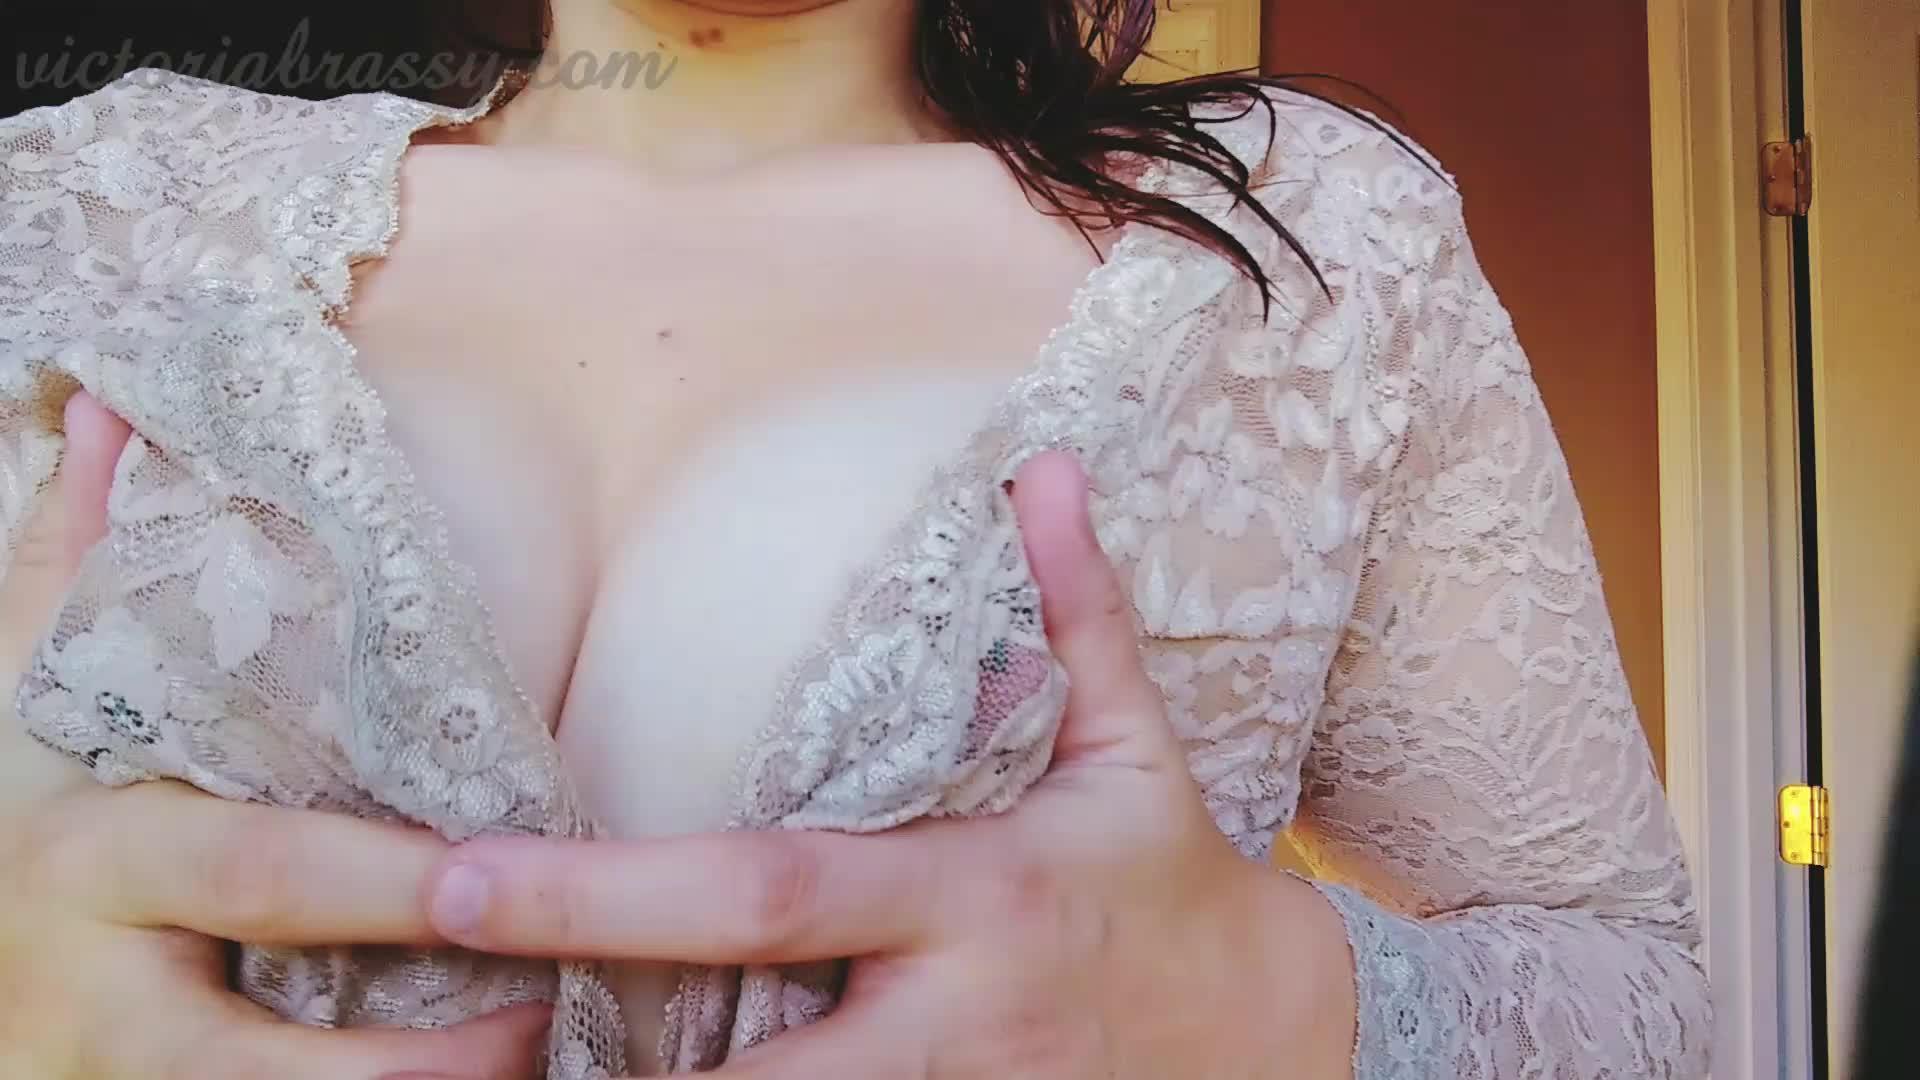 Victoria Brassy'd vid